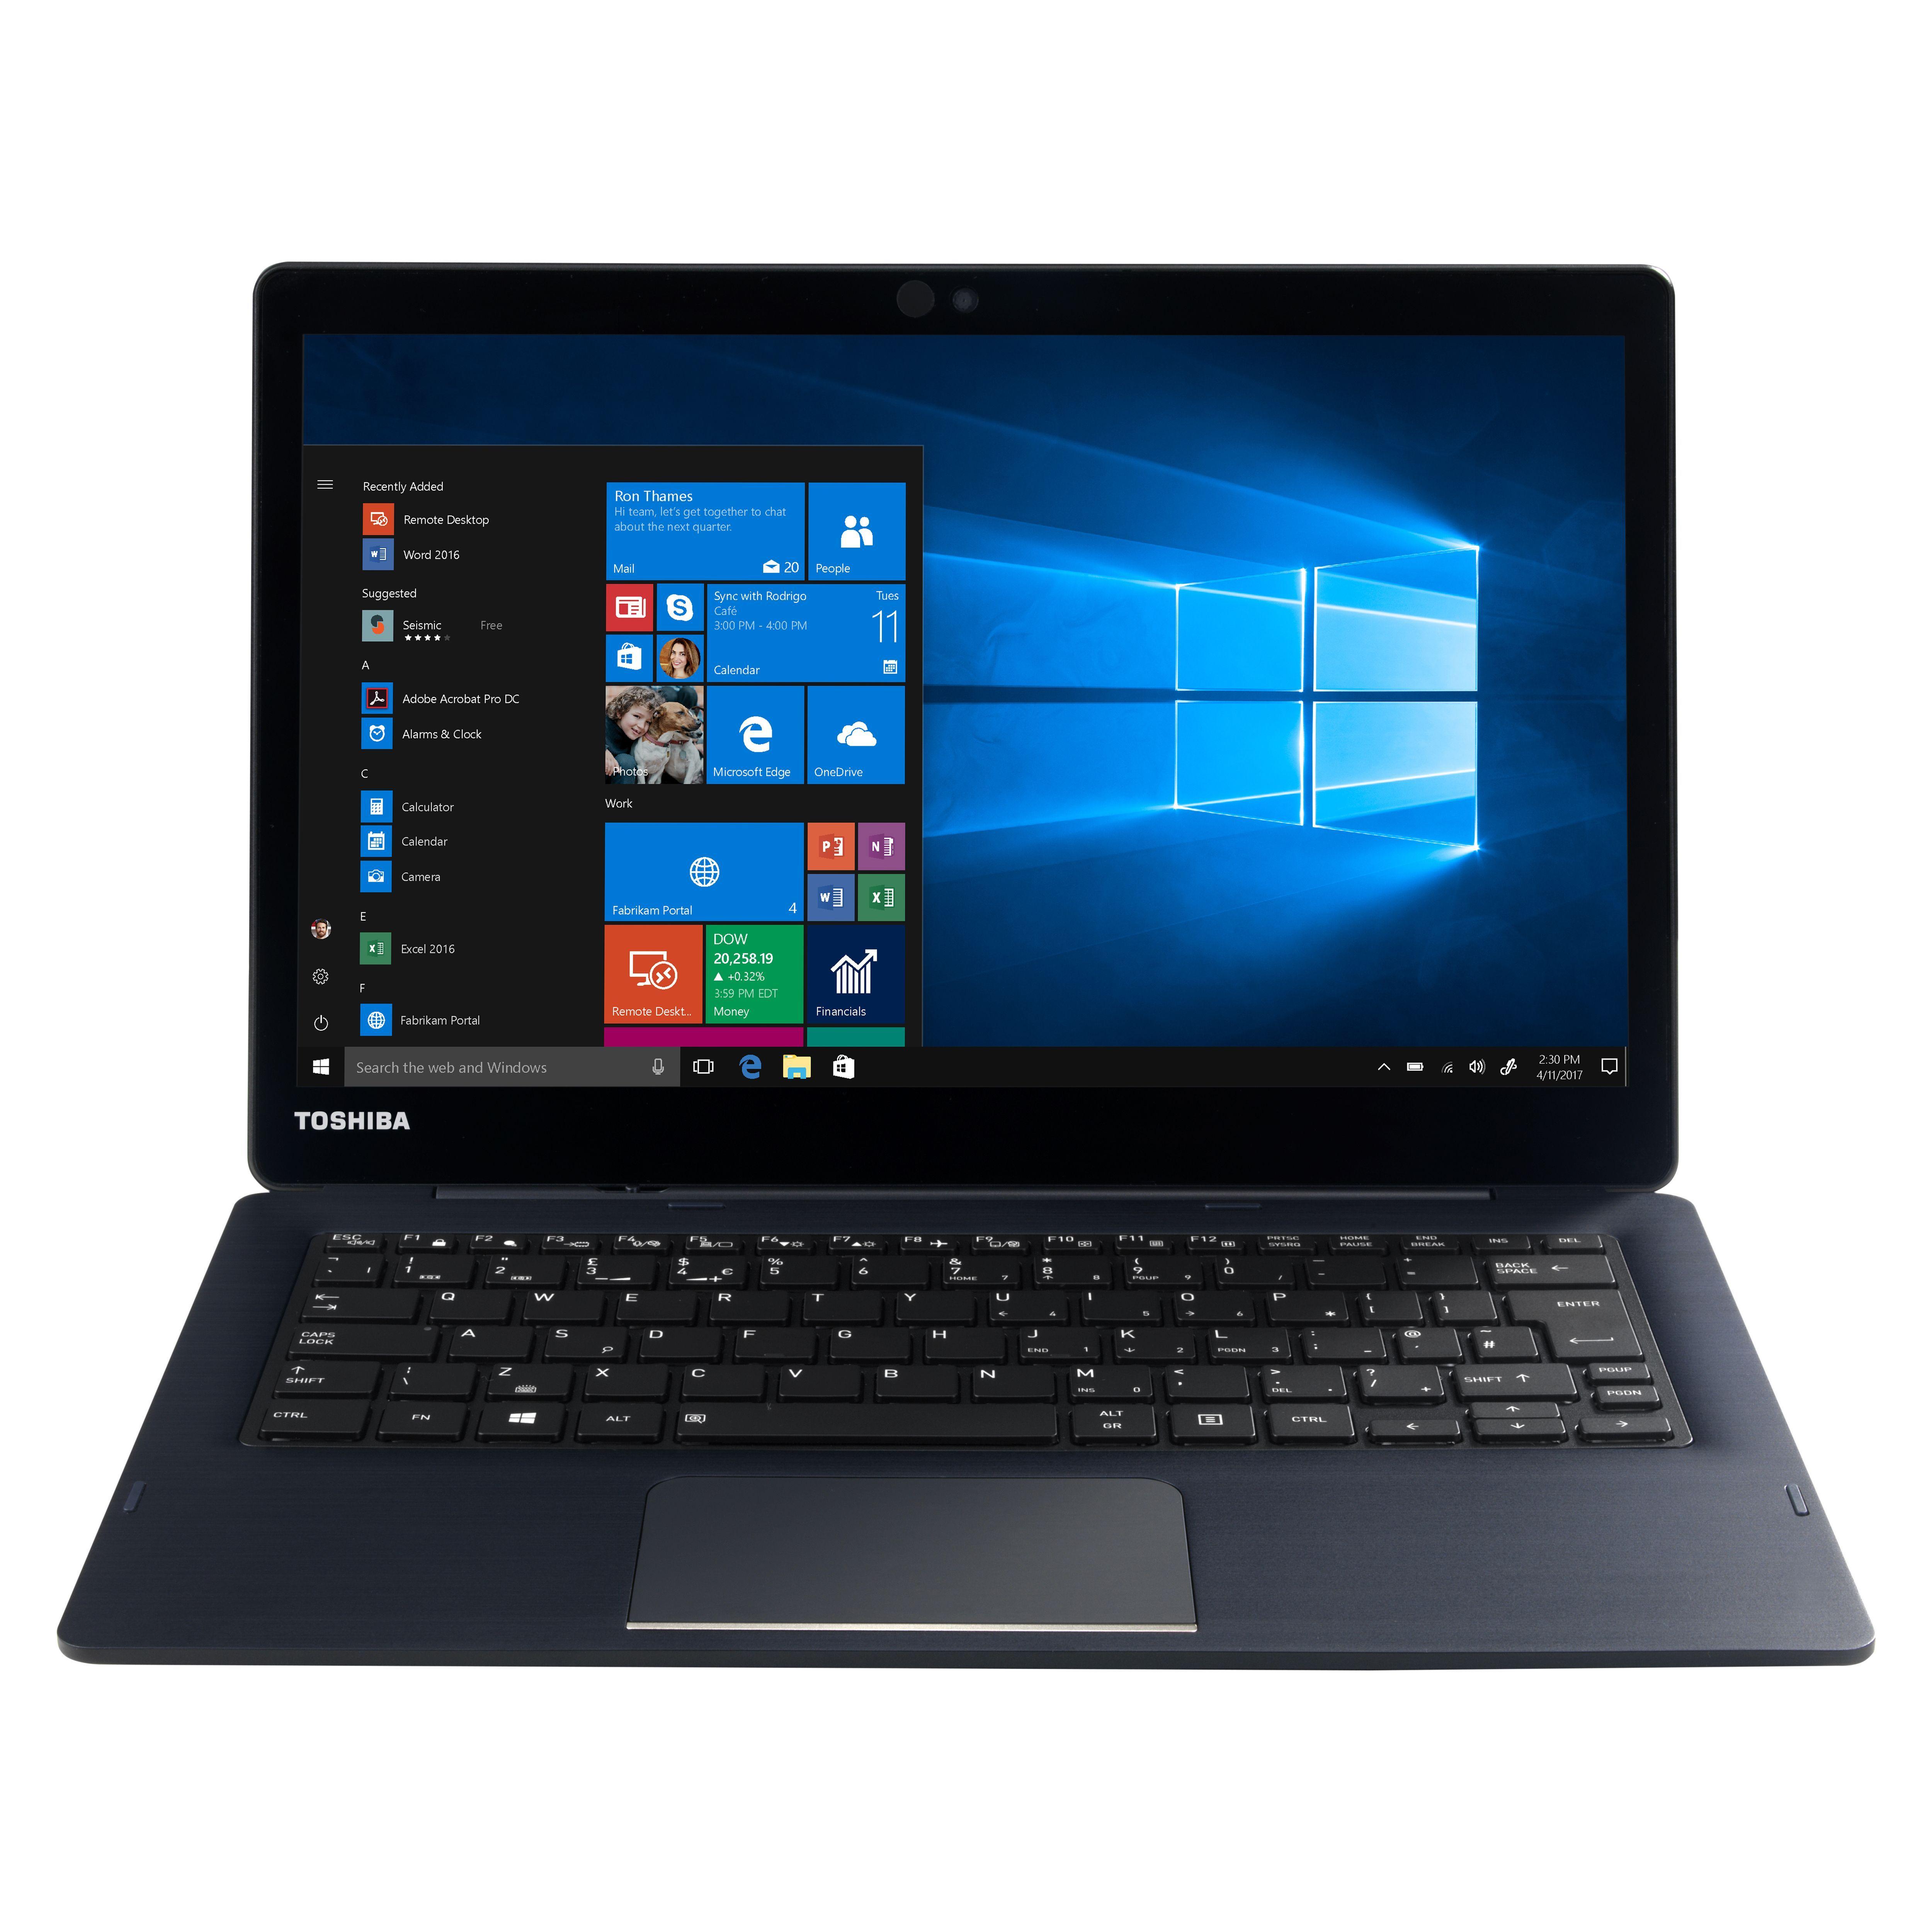 Toshiba 13 Zoll Inteli7 16gb Ram 4051528394849 Intel Core I7 8 Generation 8550u 4x 1 80 Ghz Turboboost Bis Zu 4 00 G Lenovo Ideapad Lenovo Lenovo Laptop